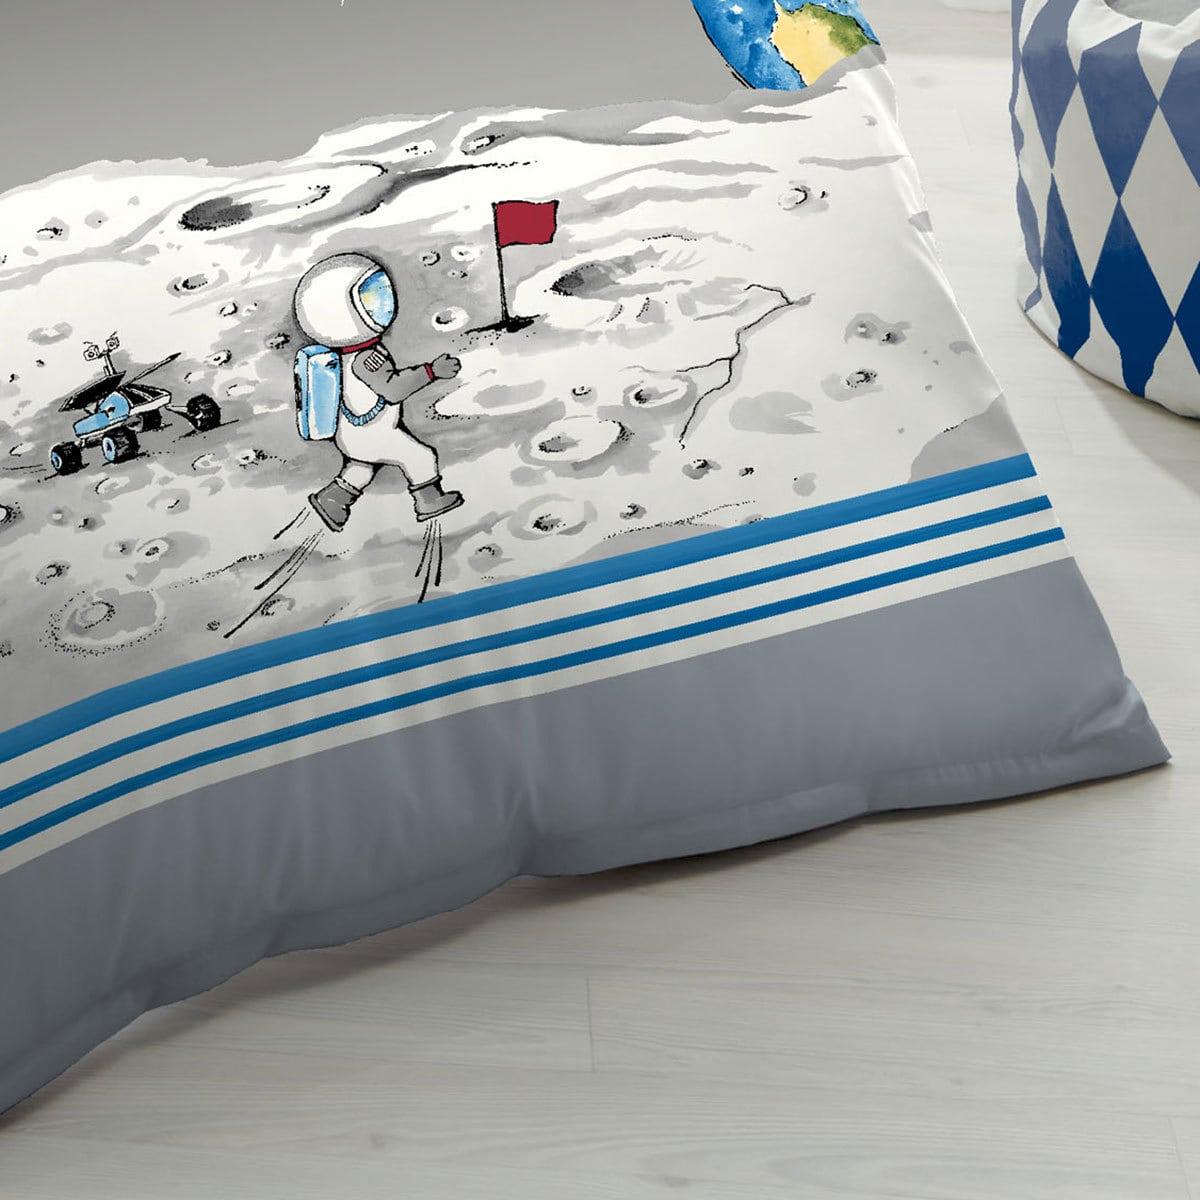 kaeppel biber kinderbettw sche astronaut g nstig online kaufen bei bettwaren shop. Black Bedroom Furniture Sets. Home Design Ideas